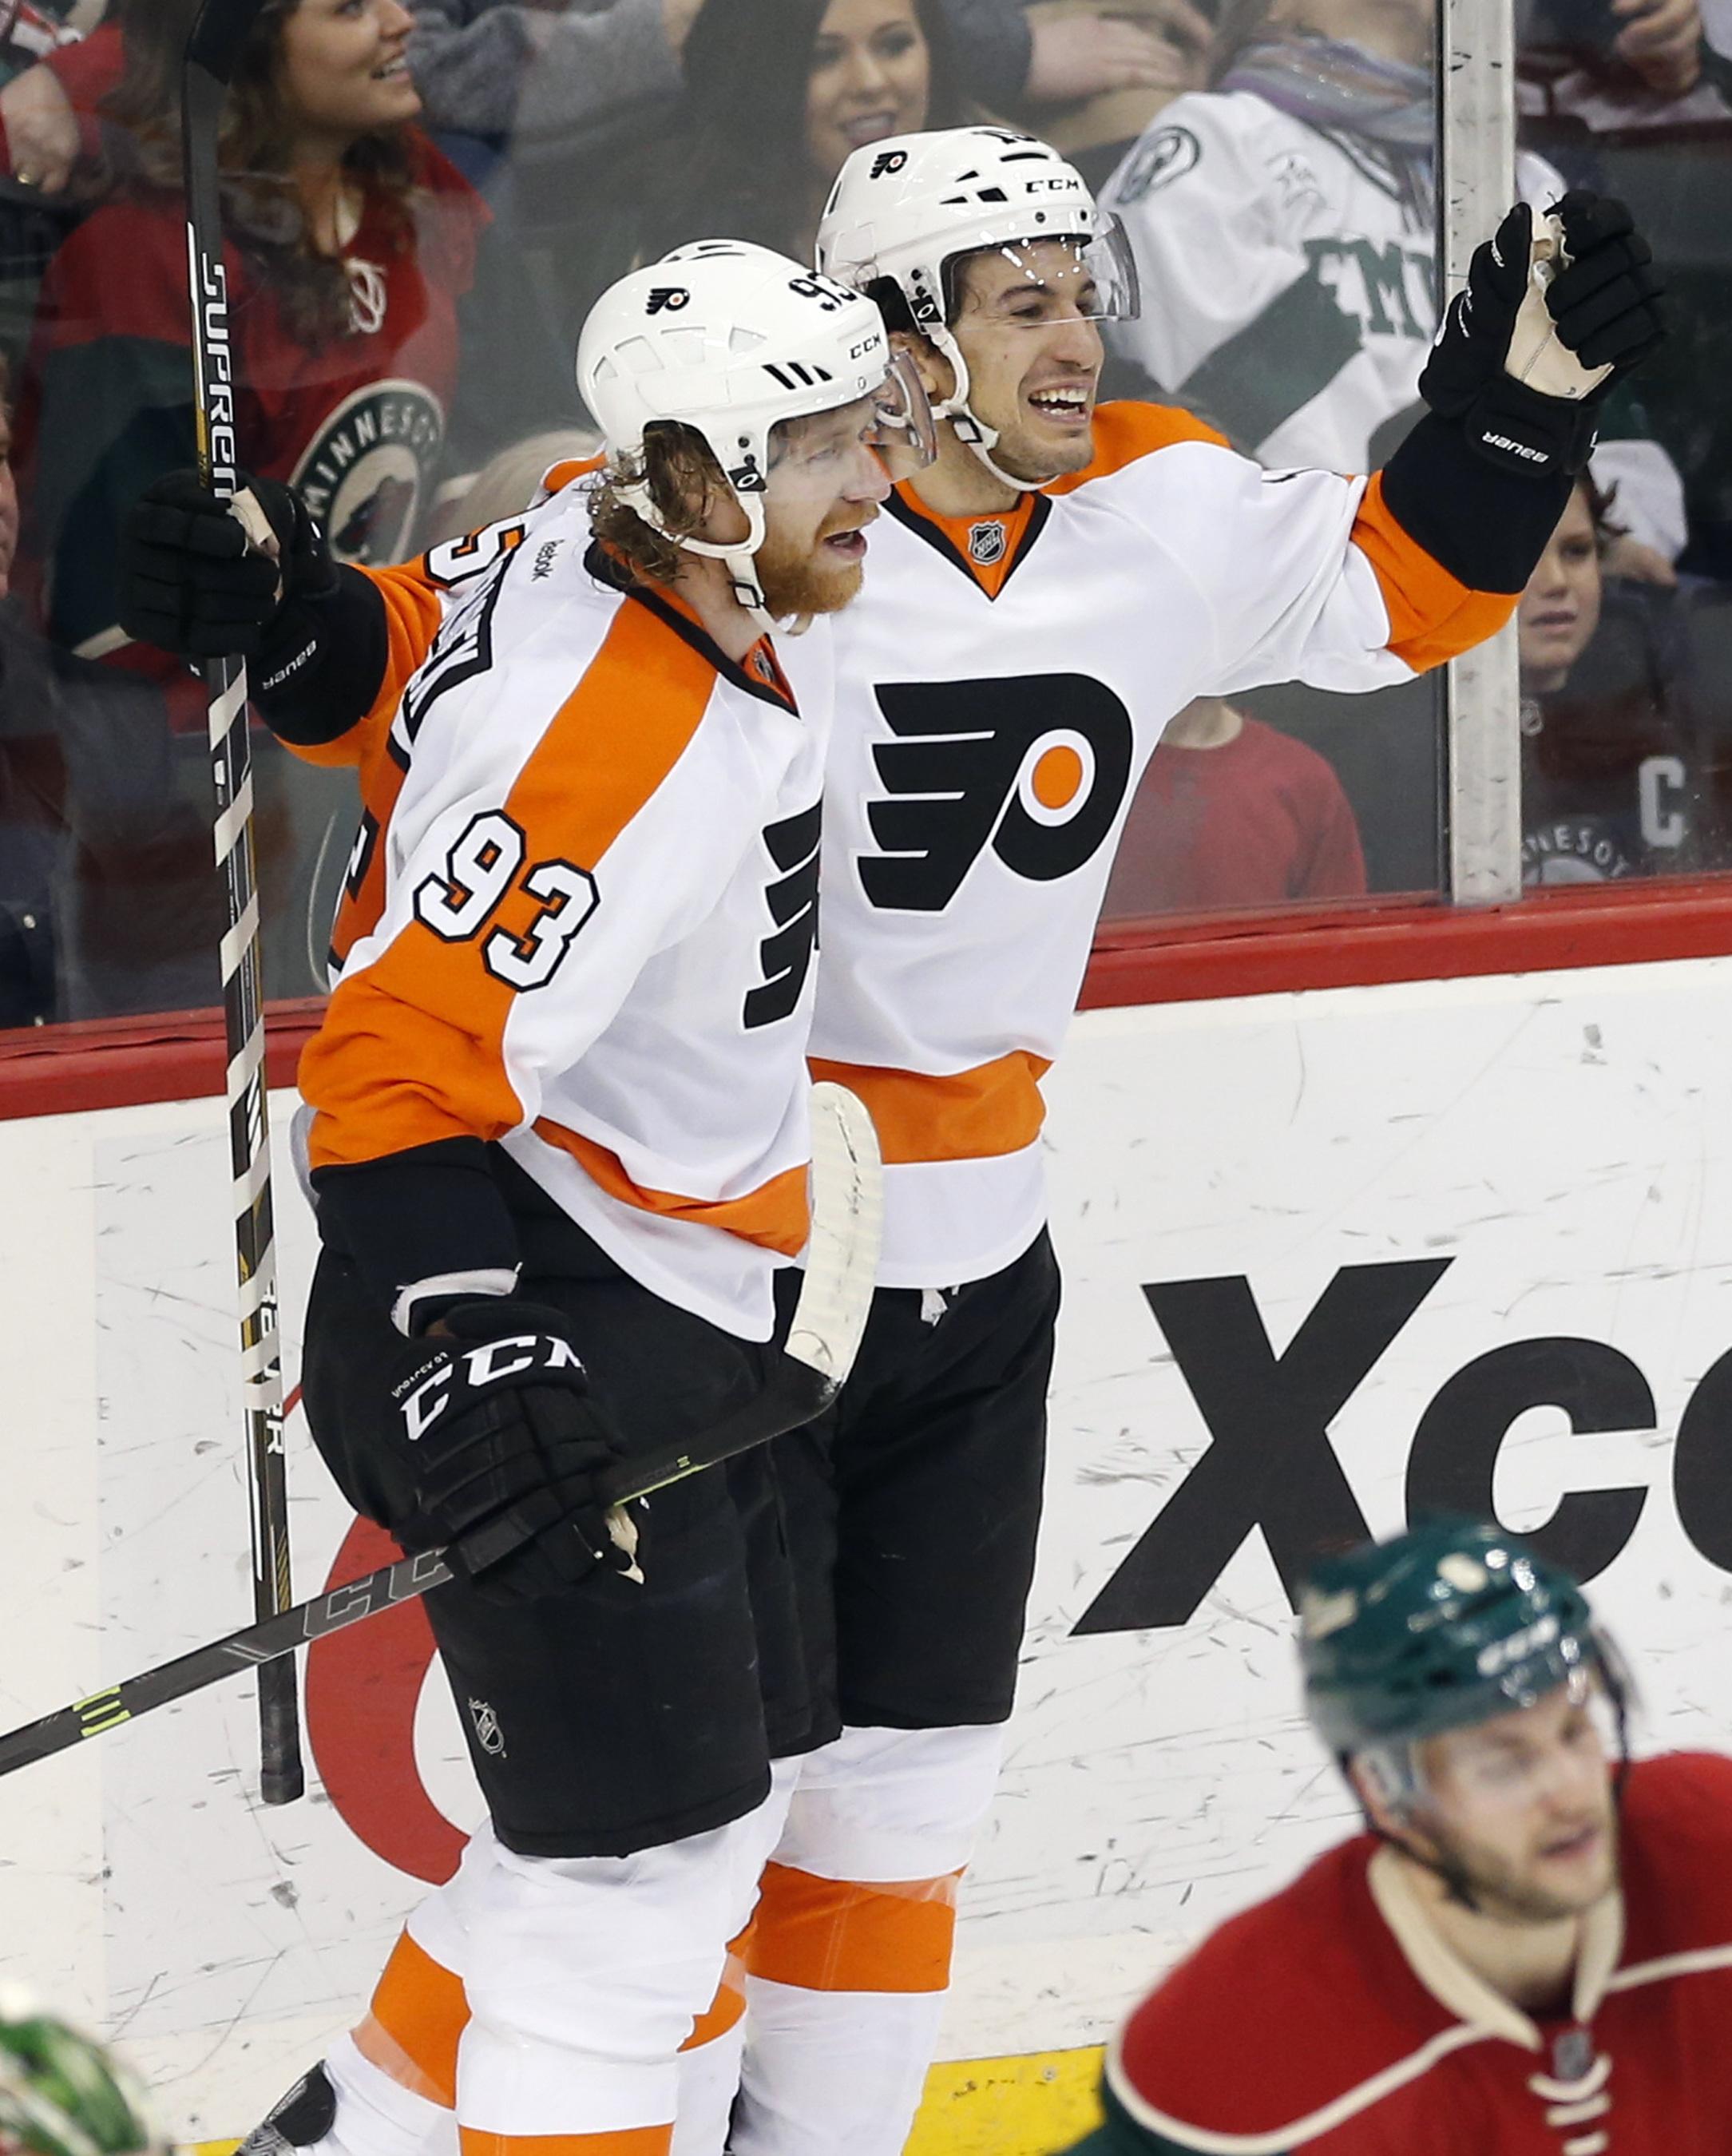 Philadelphia Flyers' Jakub Voracek, left, of Czech Republic, celebrates with Michael Del Zotto following Del Zotto's game-winning goal in overtime off Minnesota Wild goalie Devan Dubnyk in an NHL hockey game, Thursday, Jan. 7, 2016, in St. Paul, Minn. The